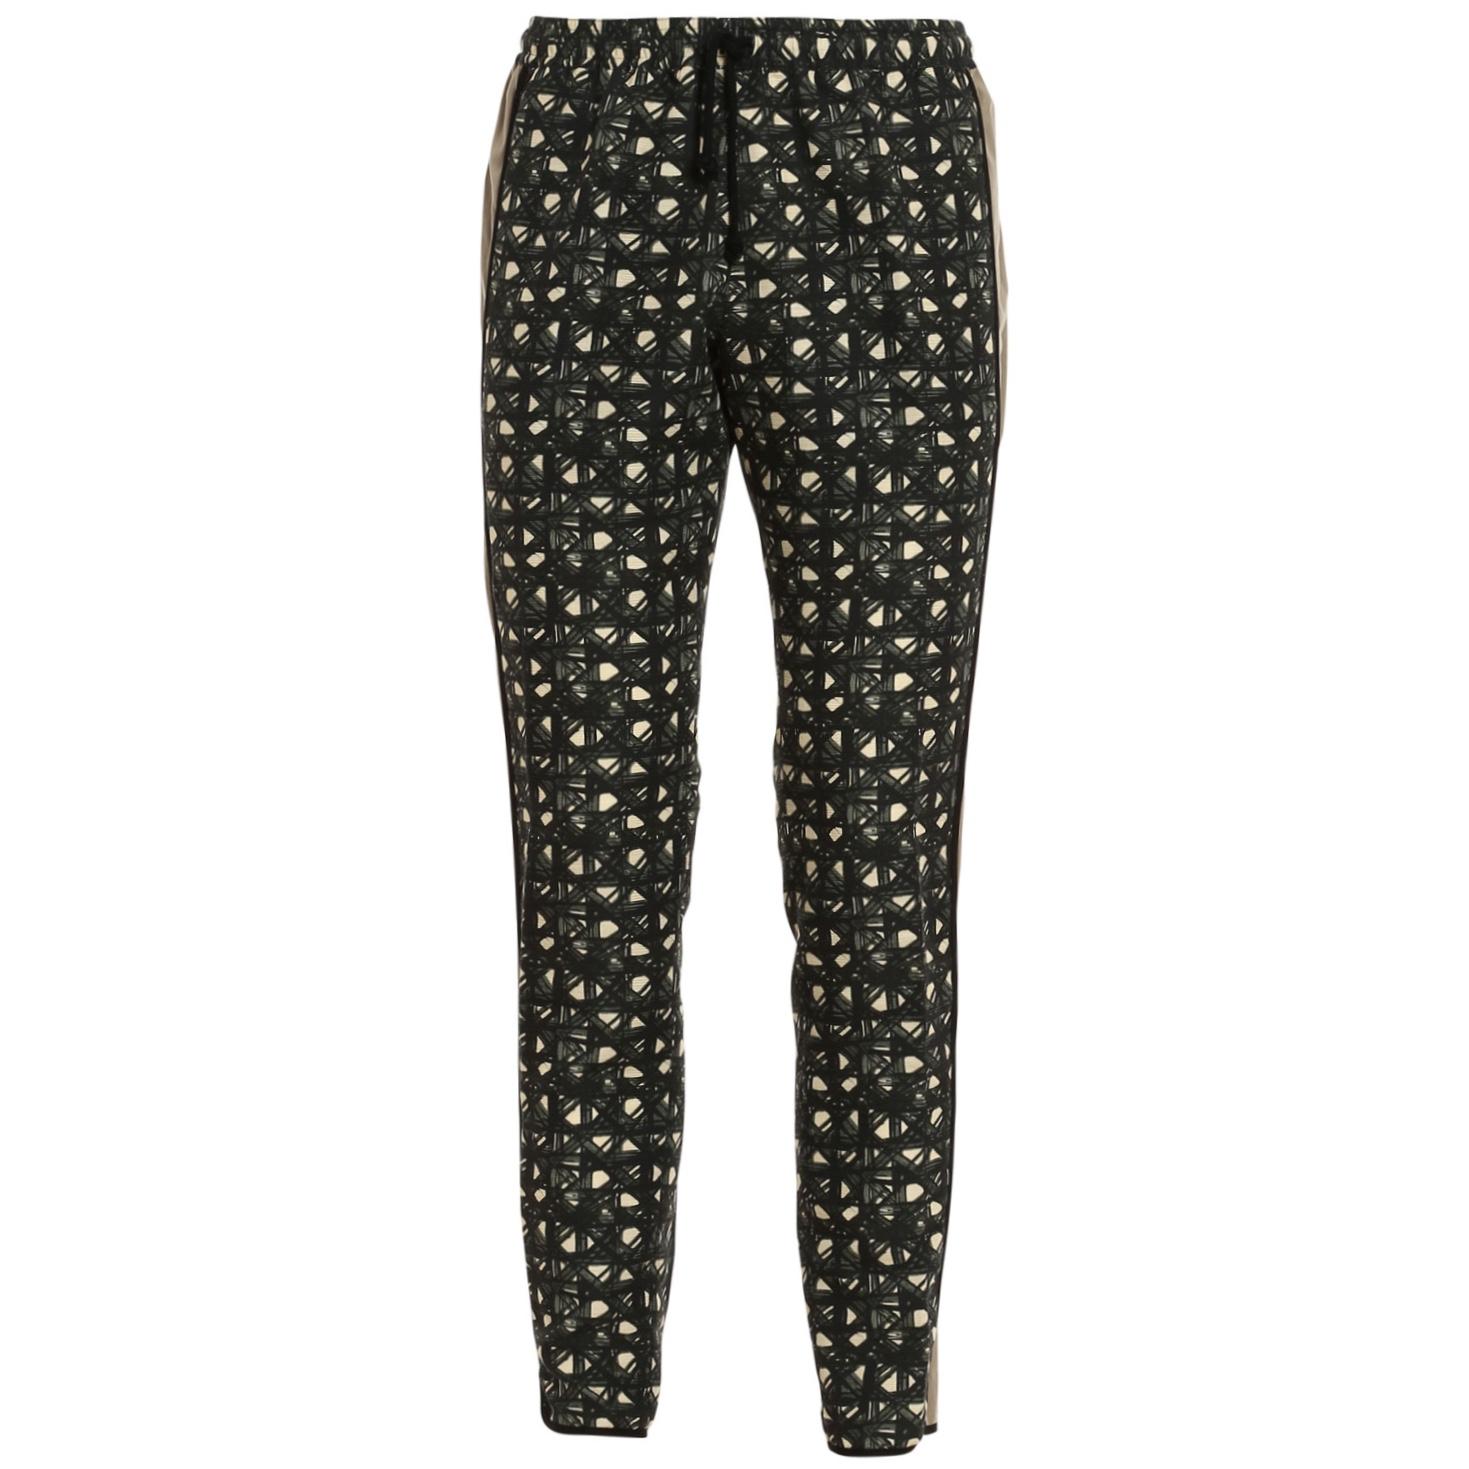 dries-van-noten-casual-trousers-pyor-trousers-00000033883f00s011.jpg